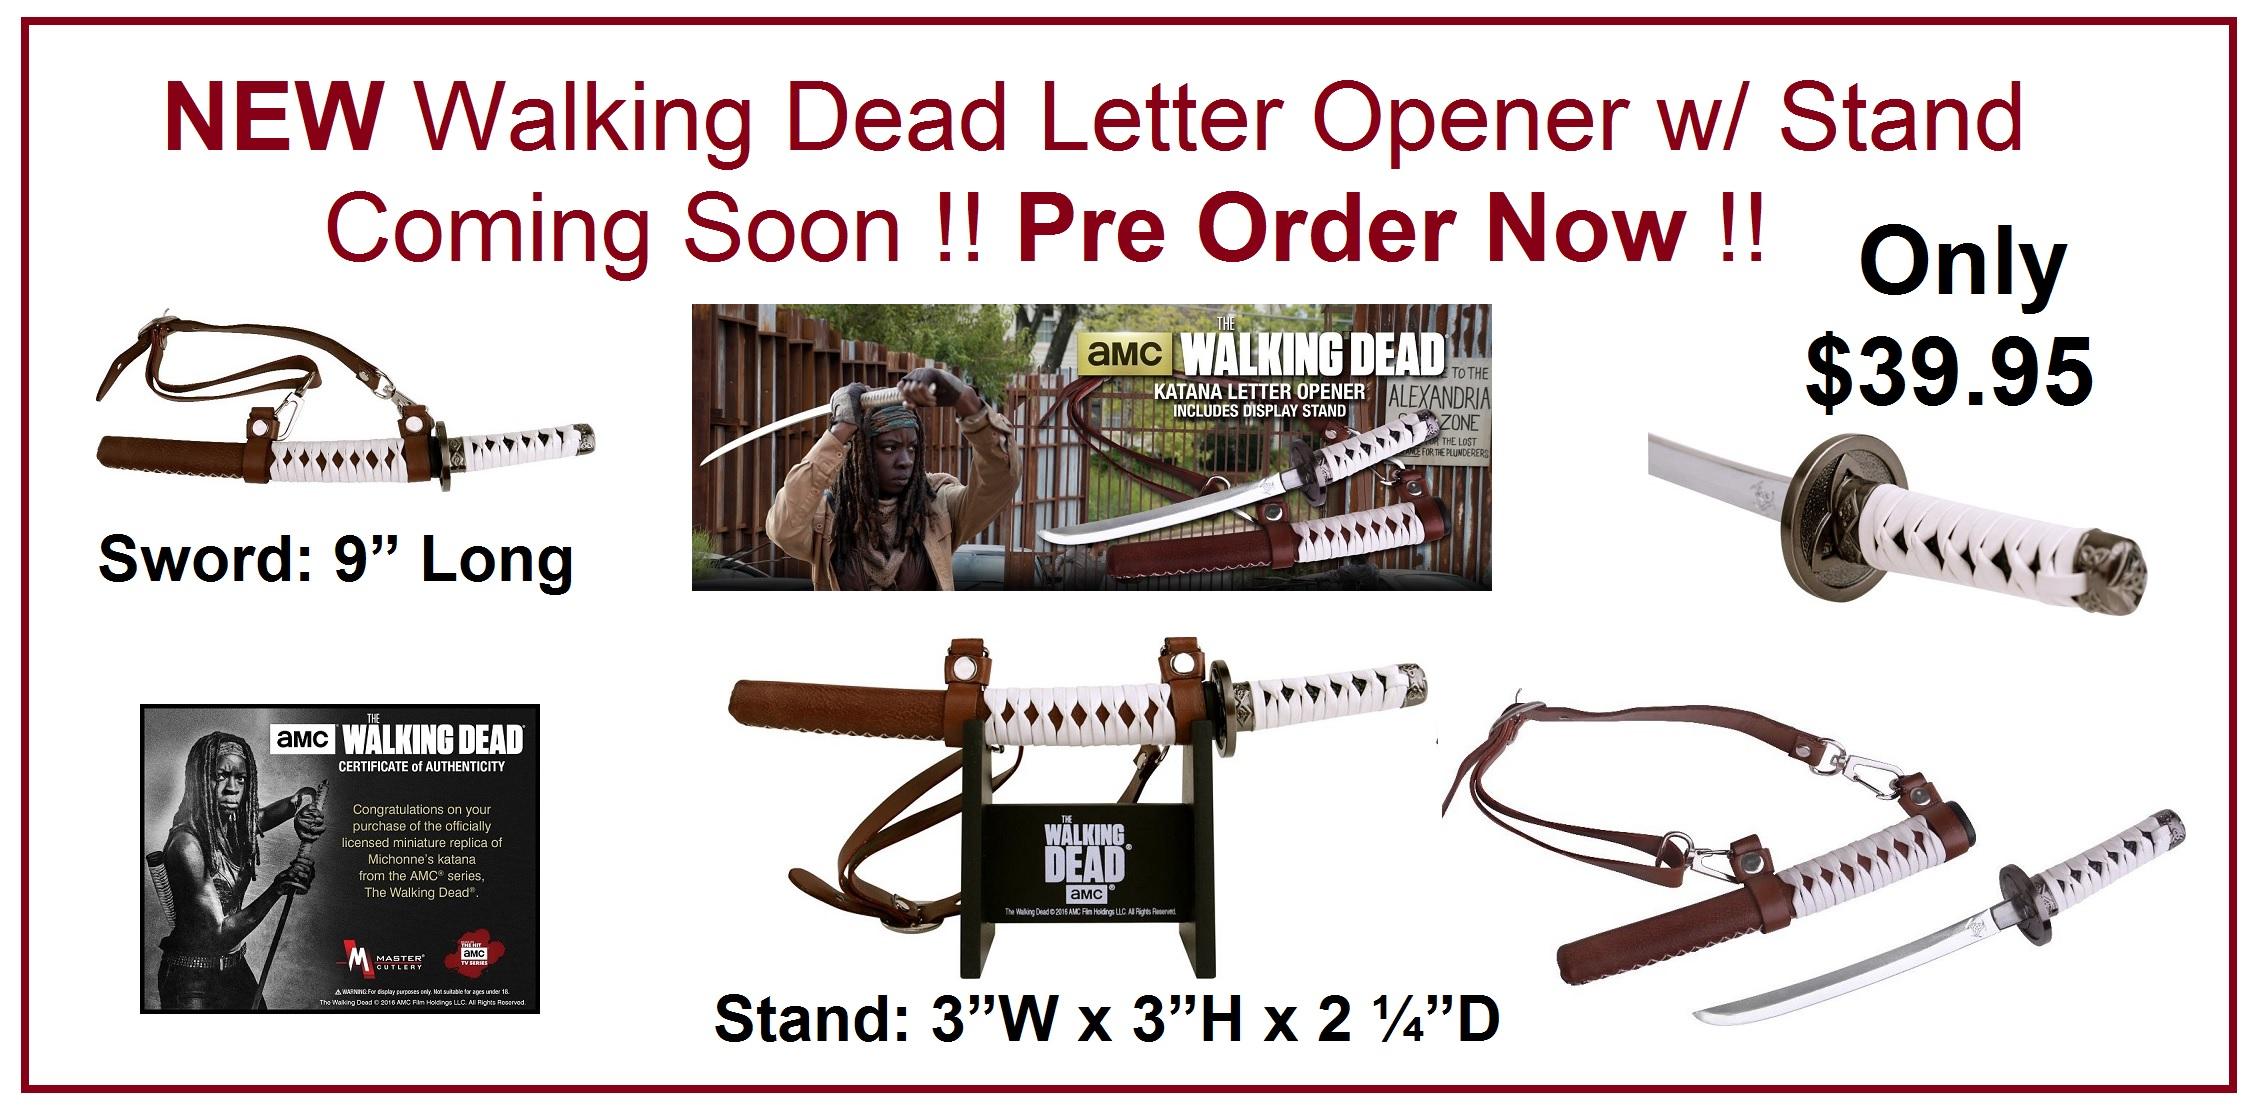 NEW WALKING DEAD LETTER OPENER